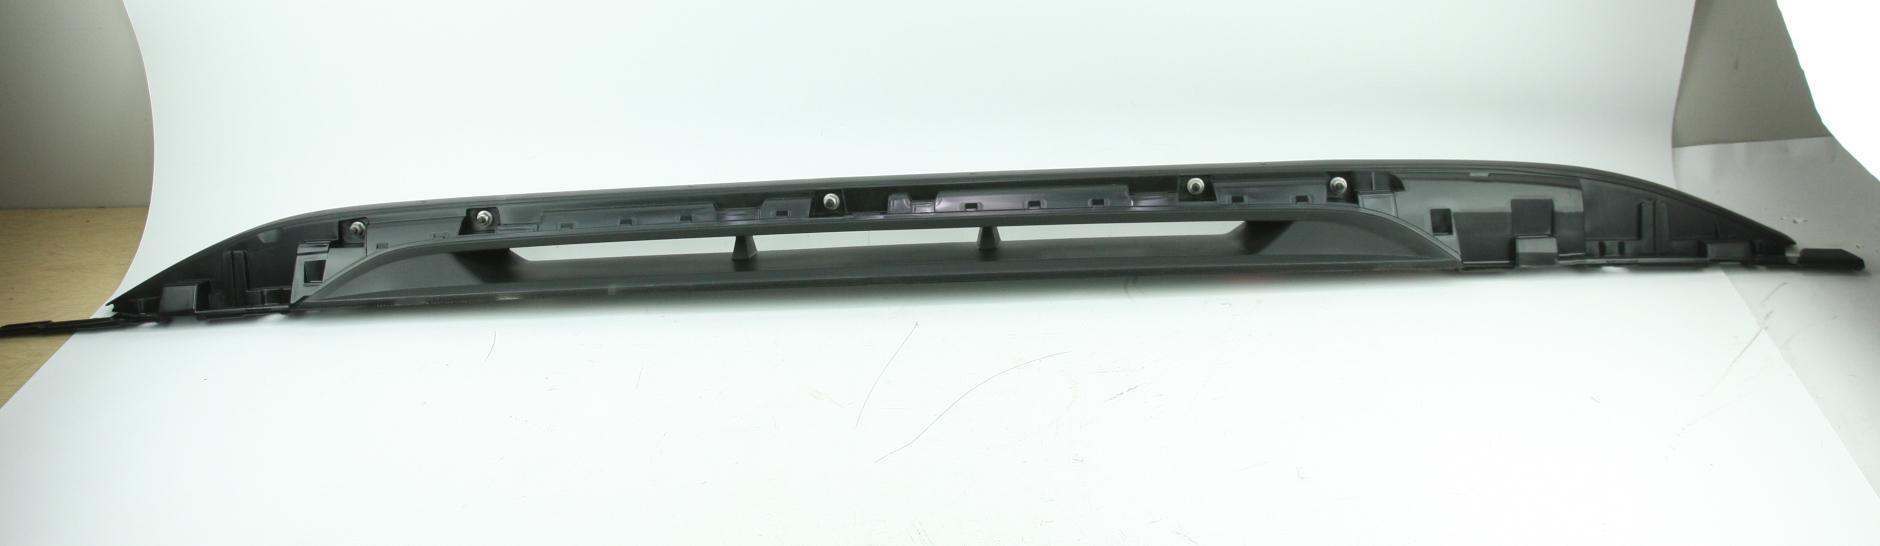 *** New Genuine OEM 23324213 GM Roof Rack Luggage Carrier Side Rail LH 84016250 - image 2